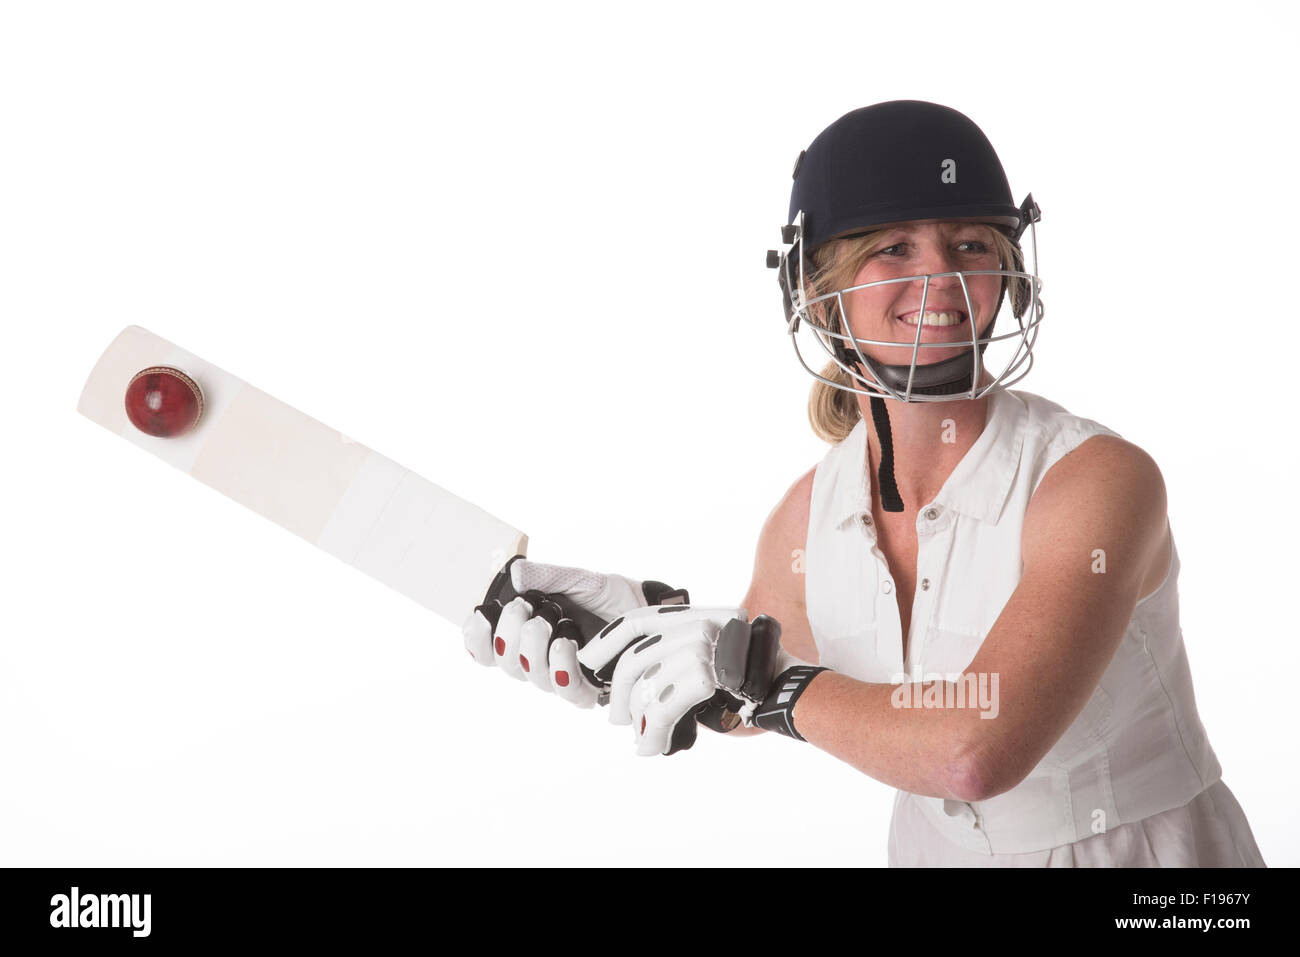 Female club cricket player hitting cricket ball with a bat cricket Stock Photo